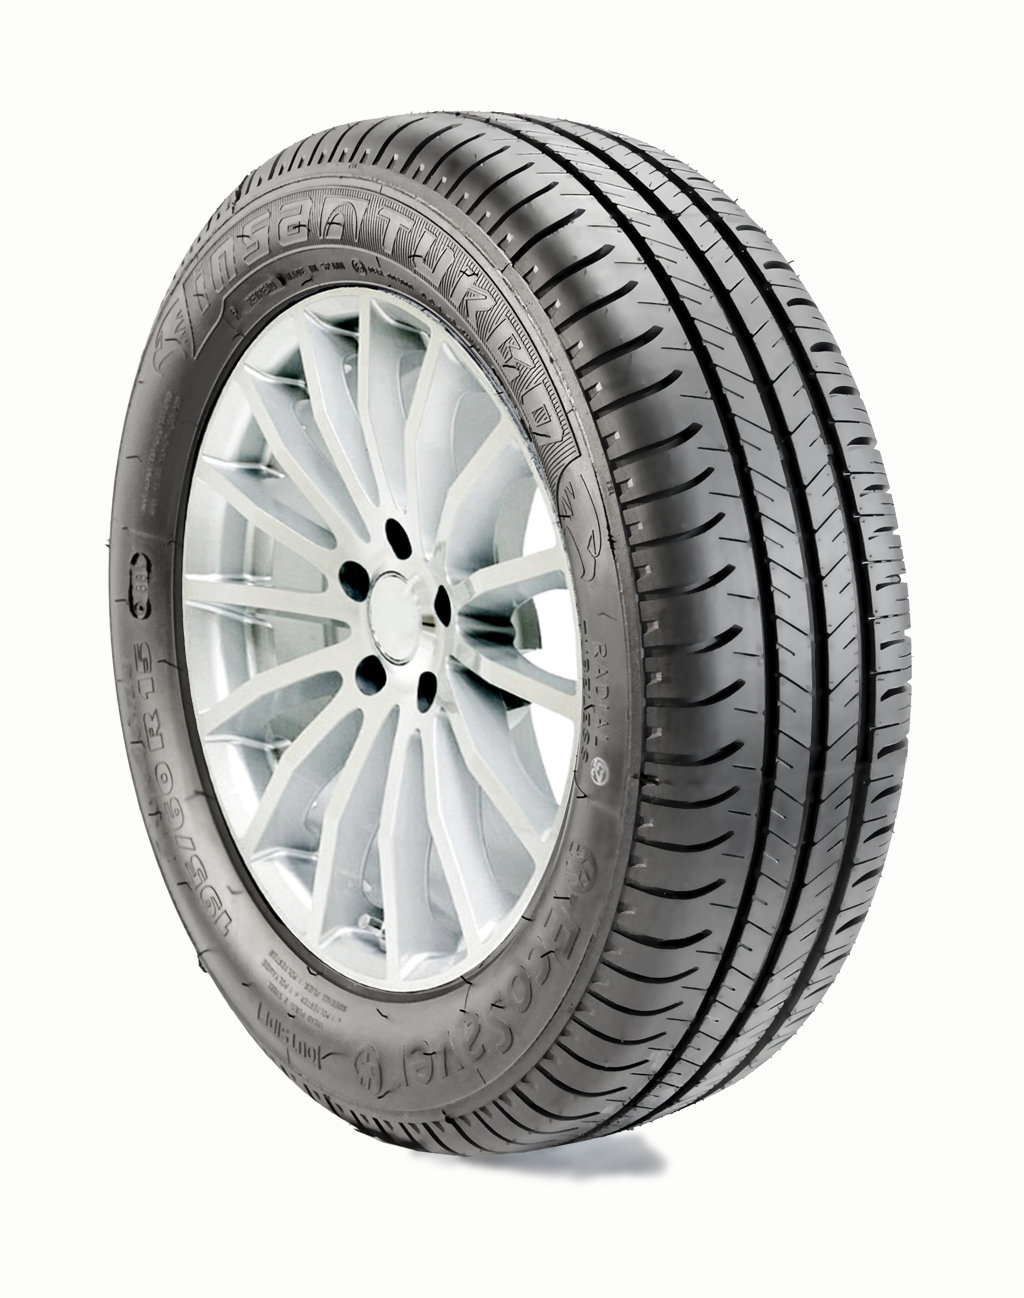 Neumático INSA TURBO ECOSAVER 3T 185/65R14 86 T